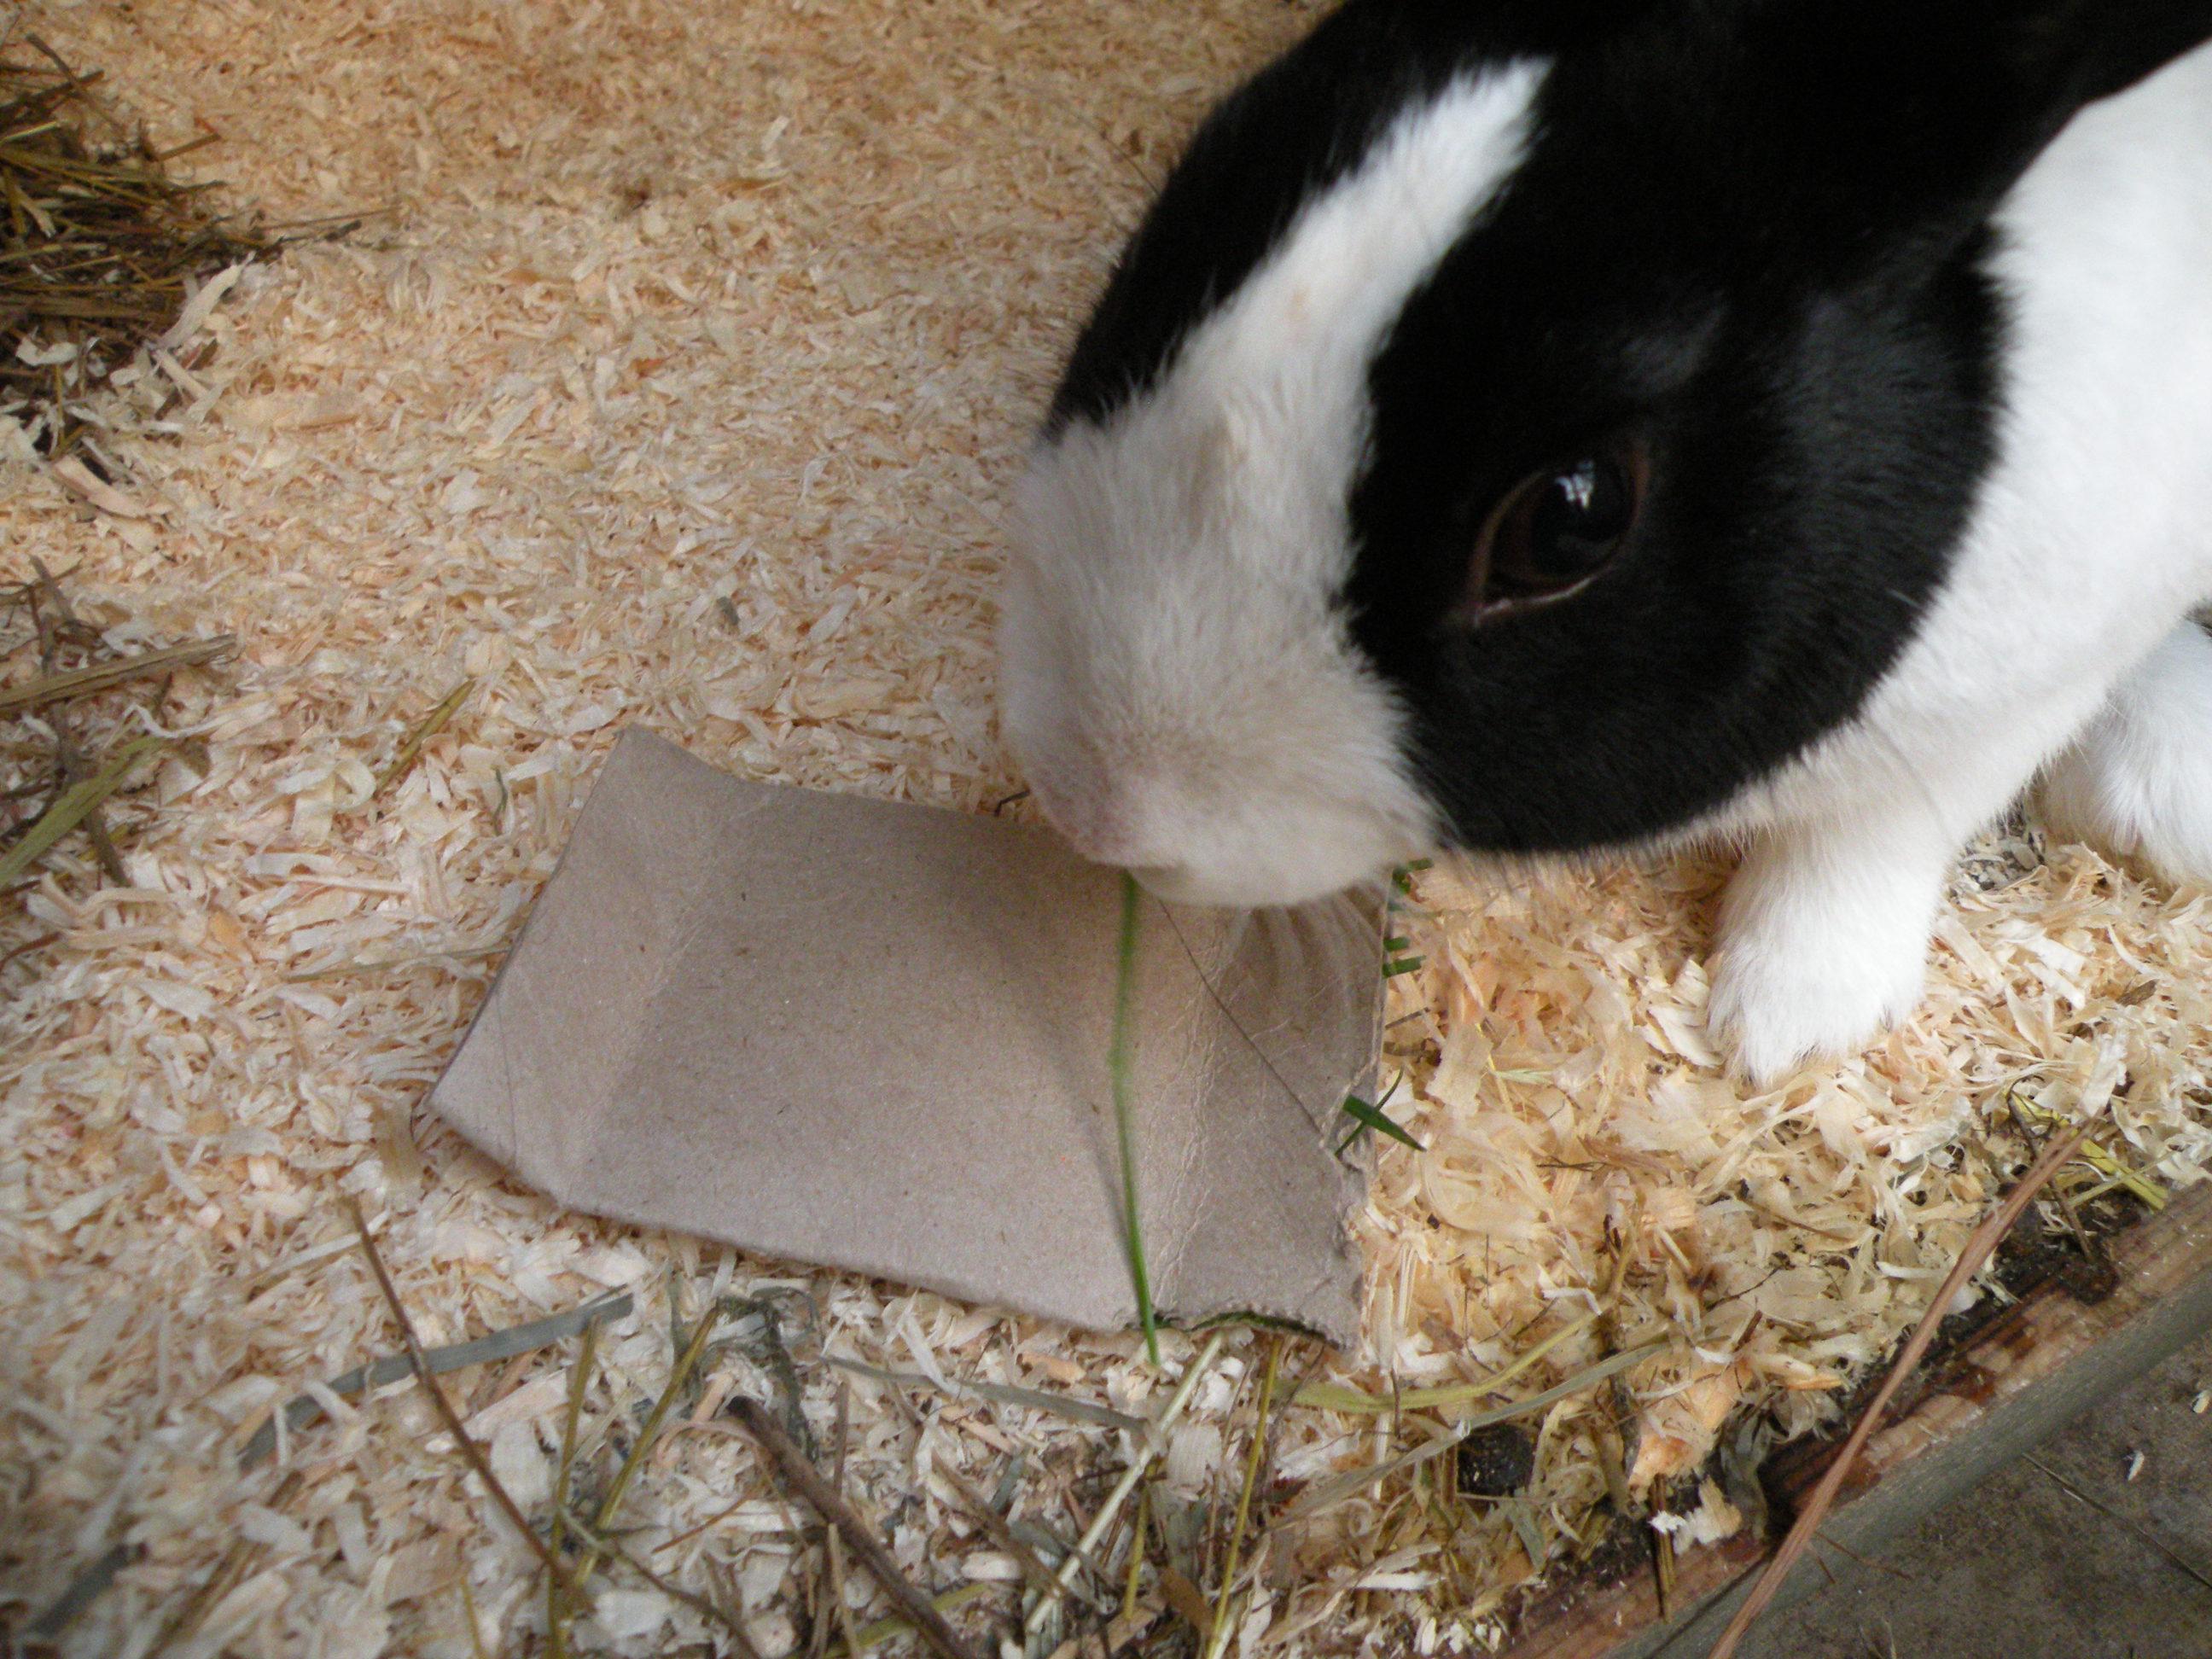 Rabbit Toys - Homemade Rabbit Toy 2